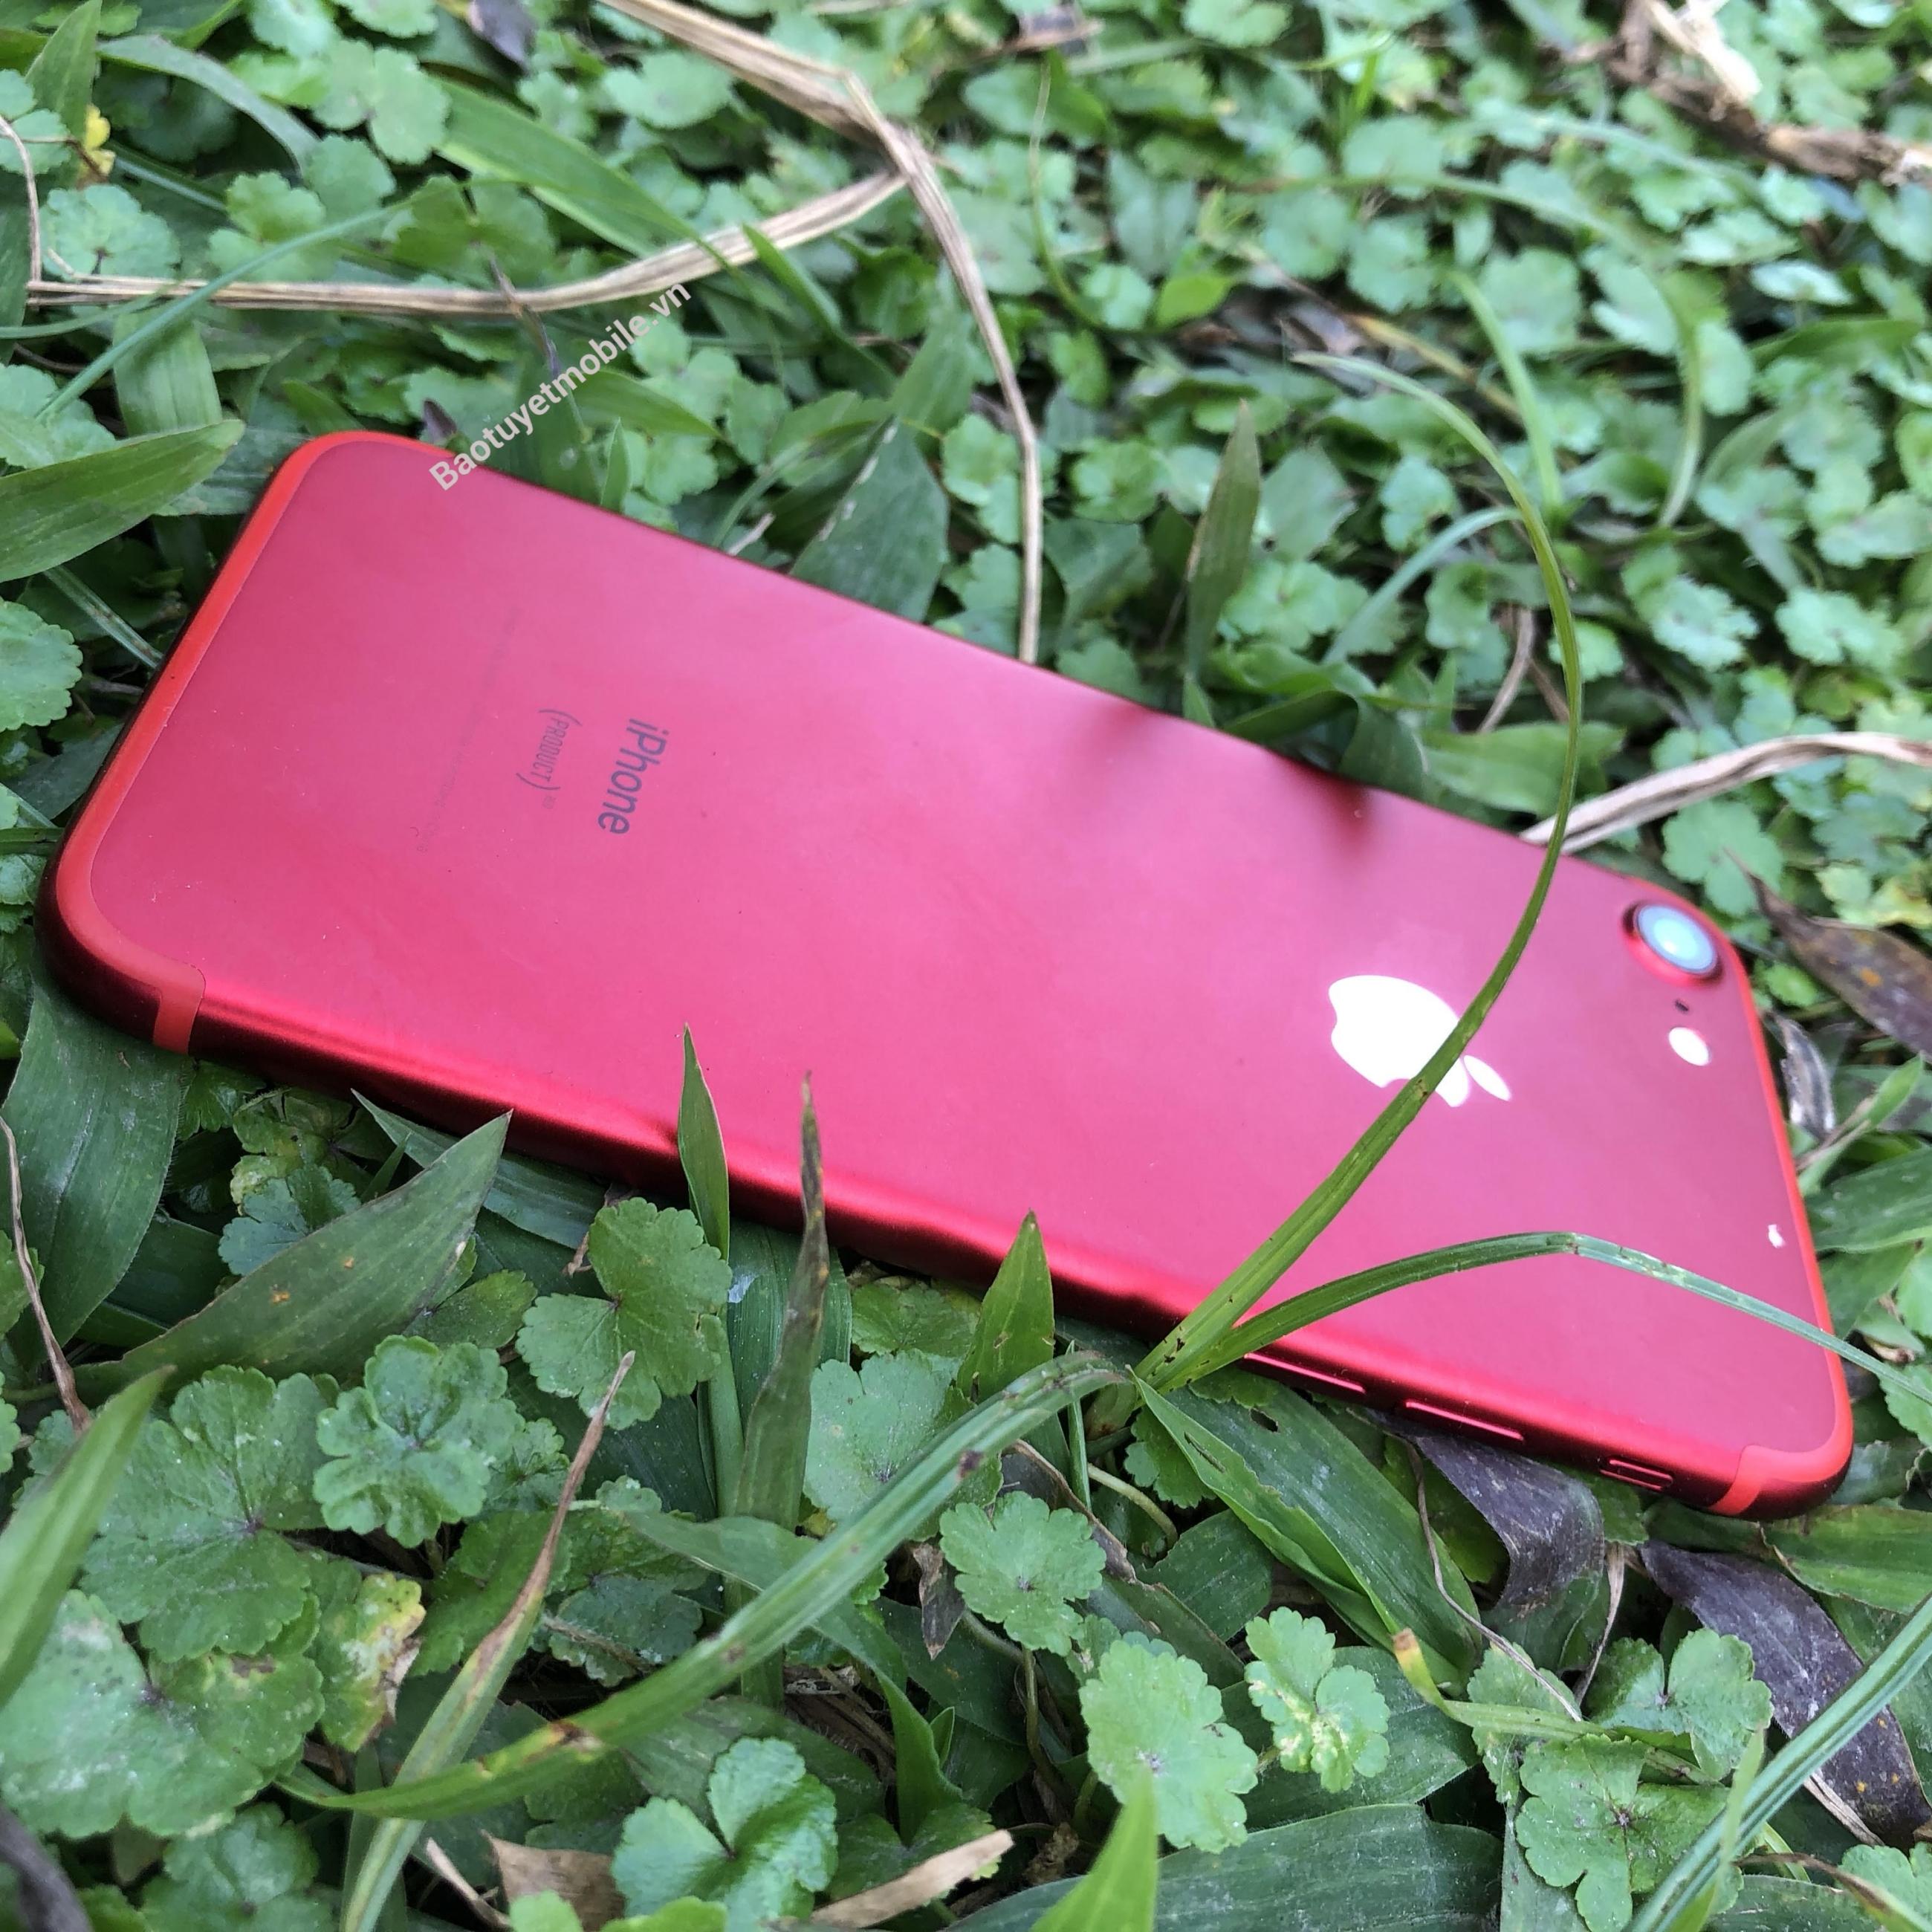 iphone 7 đỏ mặt sau